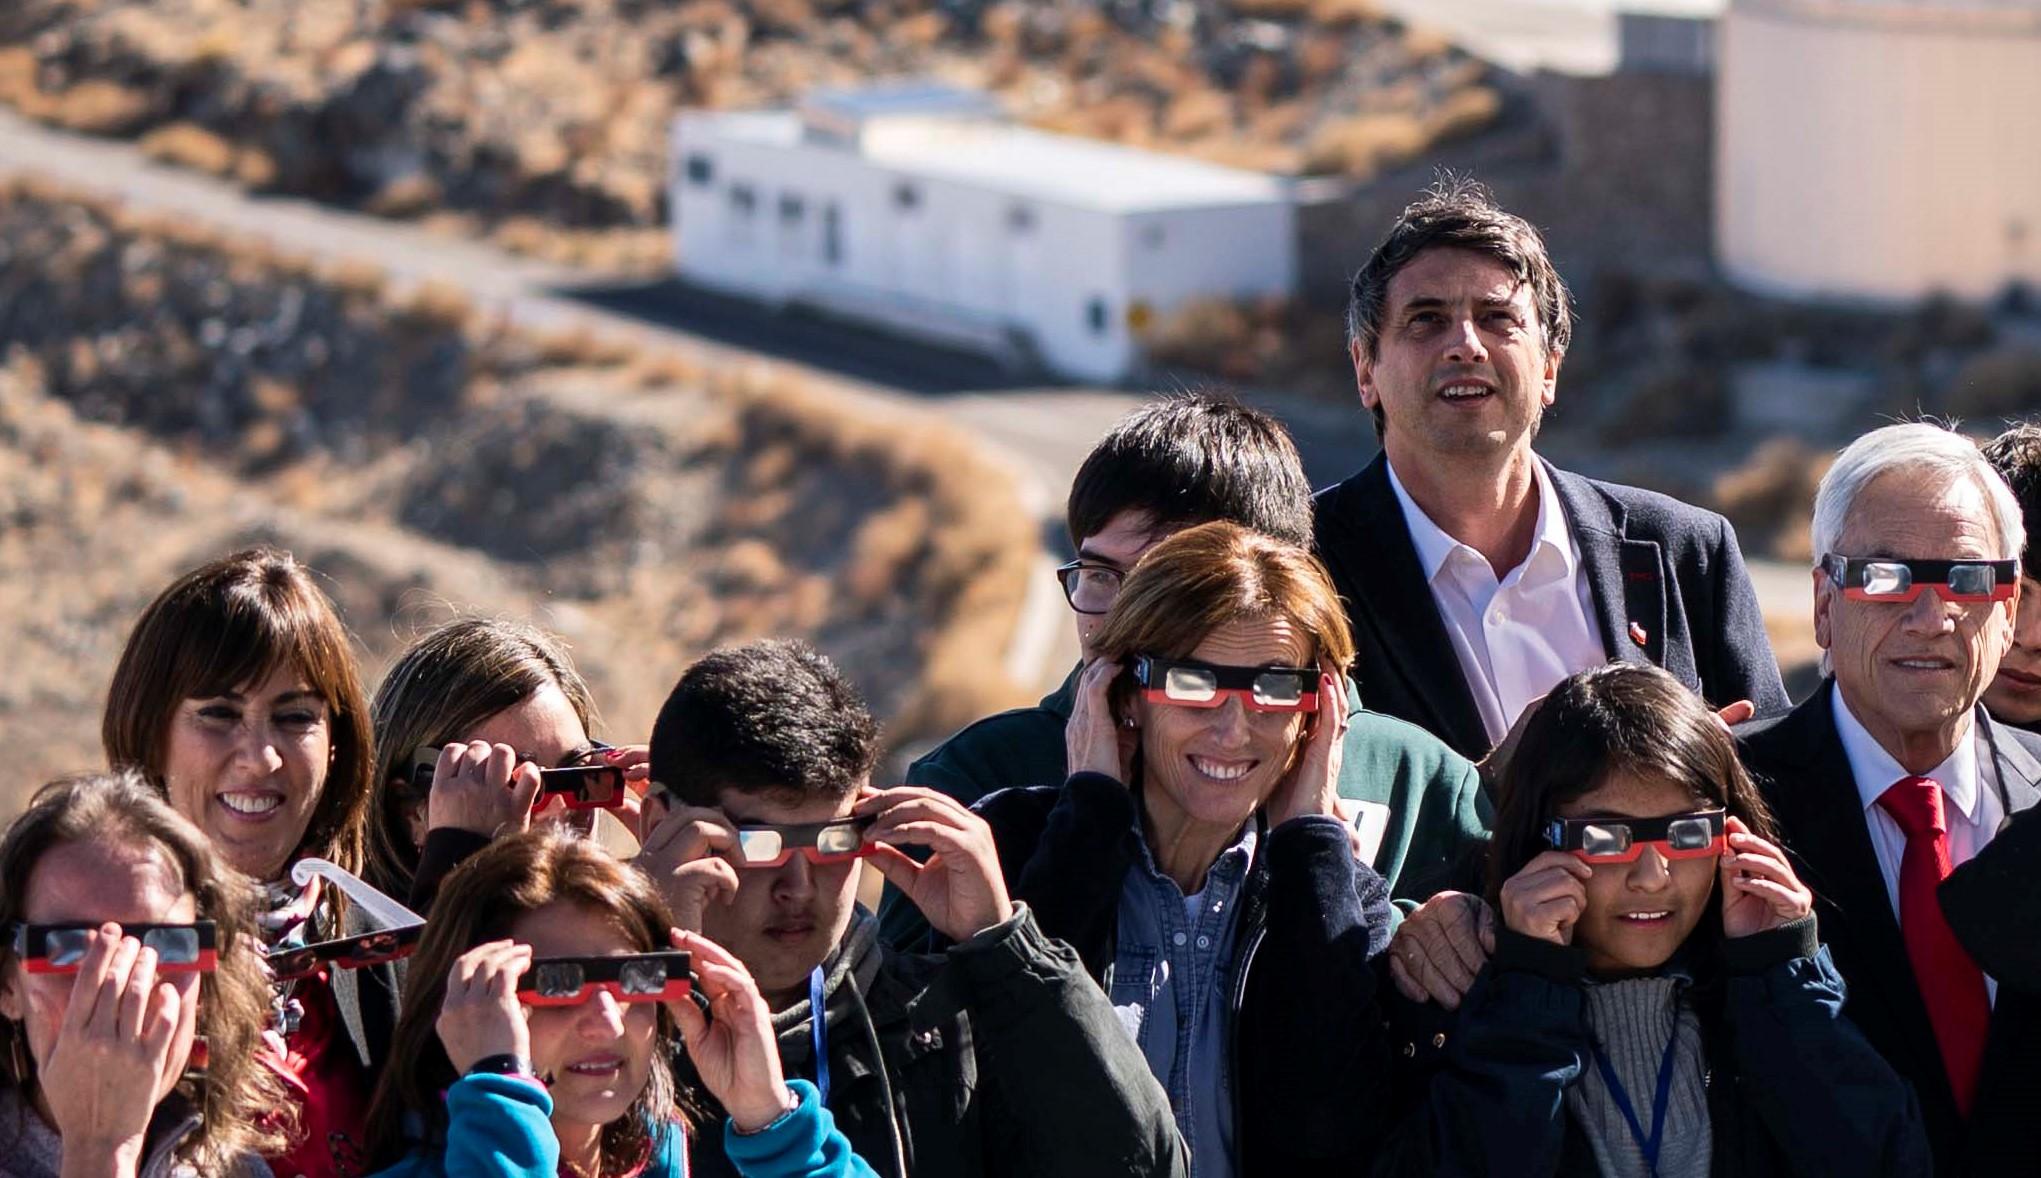 Paro docente: Ministra Cubillos se ausenta de sesión especial en Senado por viajar a ver eclipse a Coquimbo